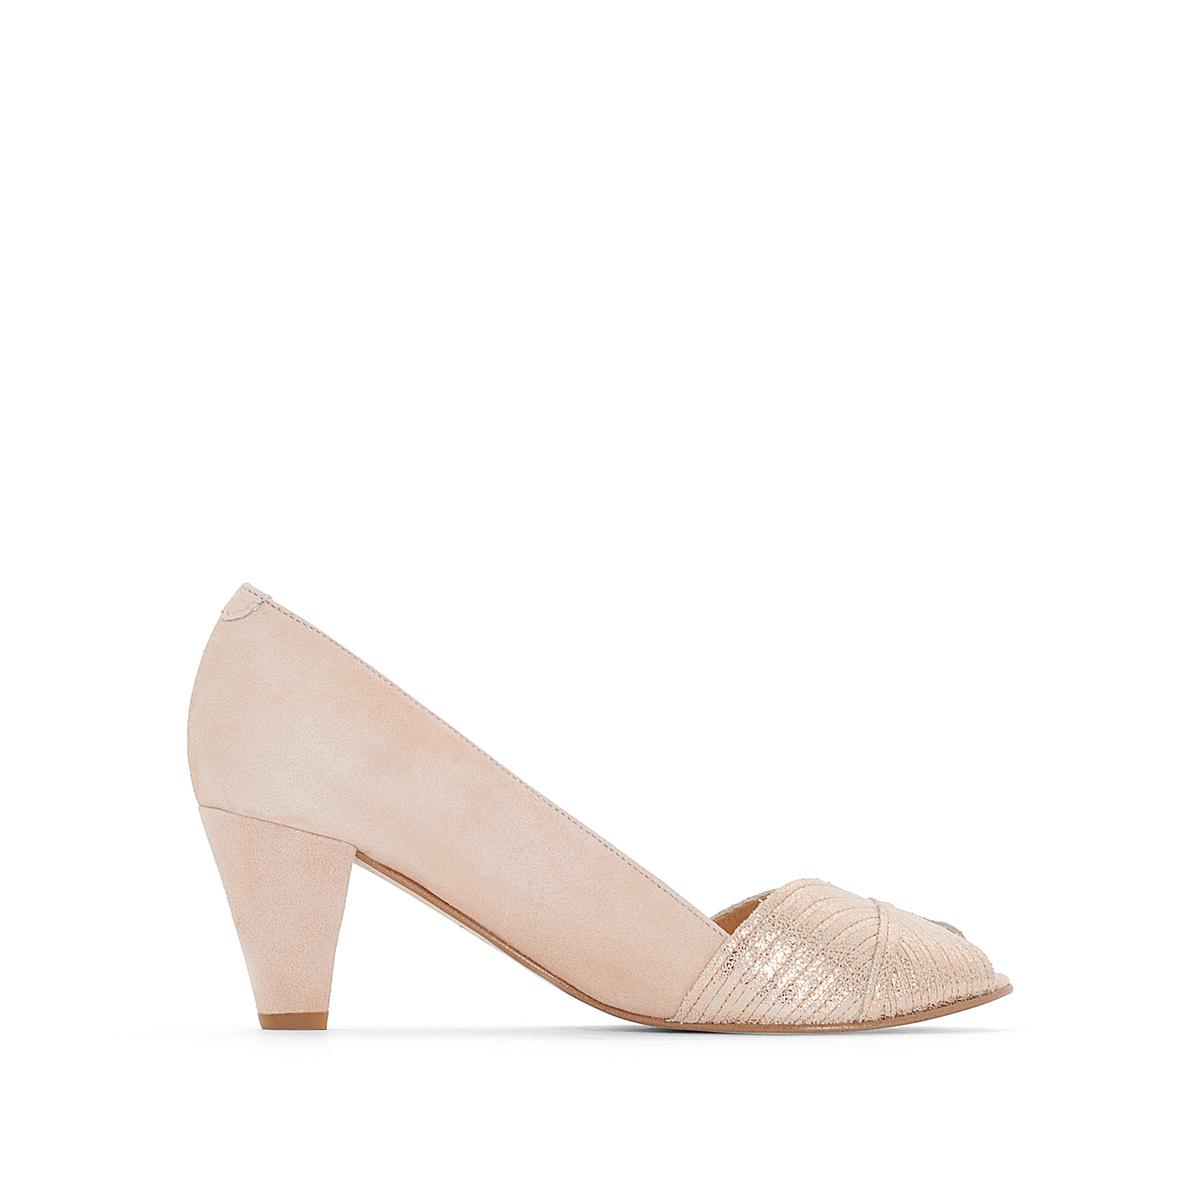 Туфли-лодочки кожаные на широком каблуке, Depois туфли tamaris туфли лодочки